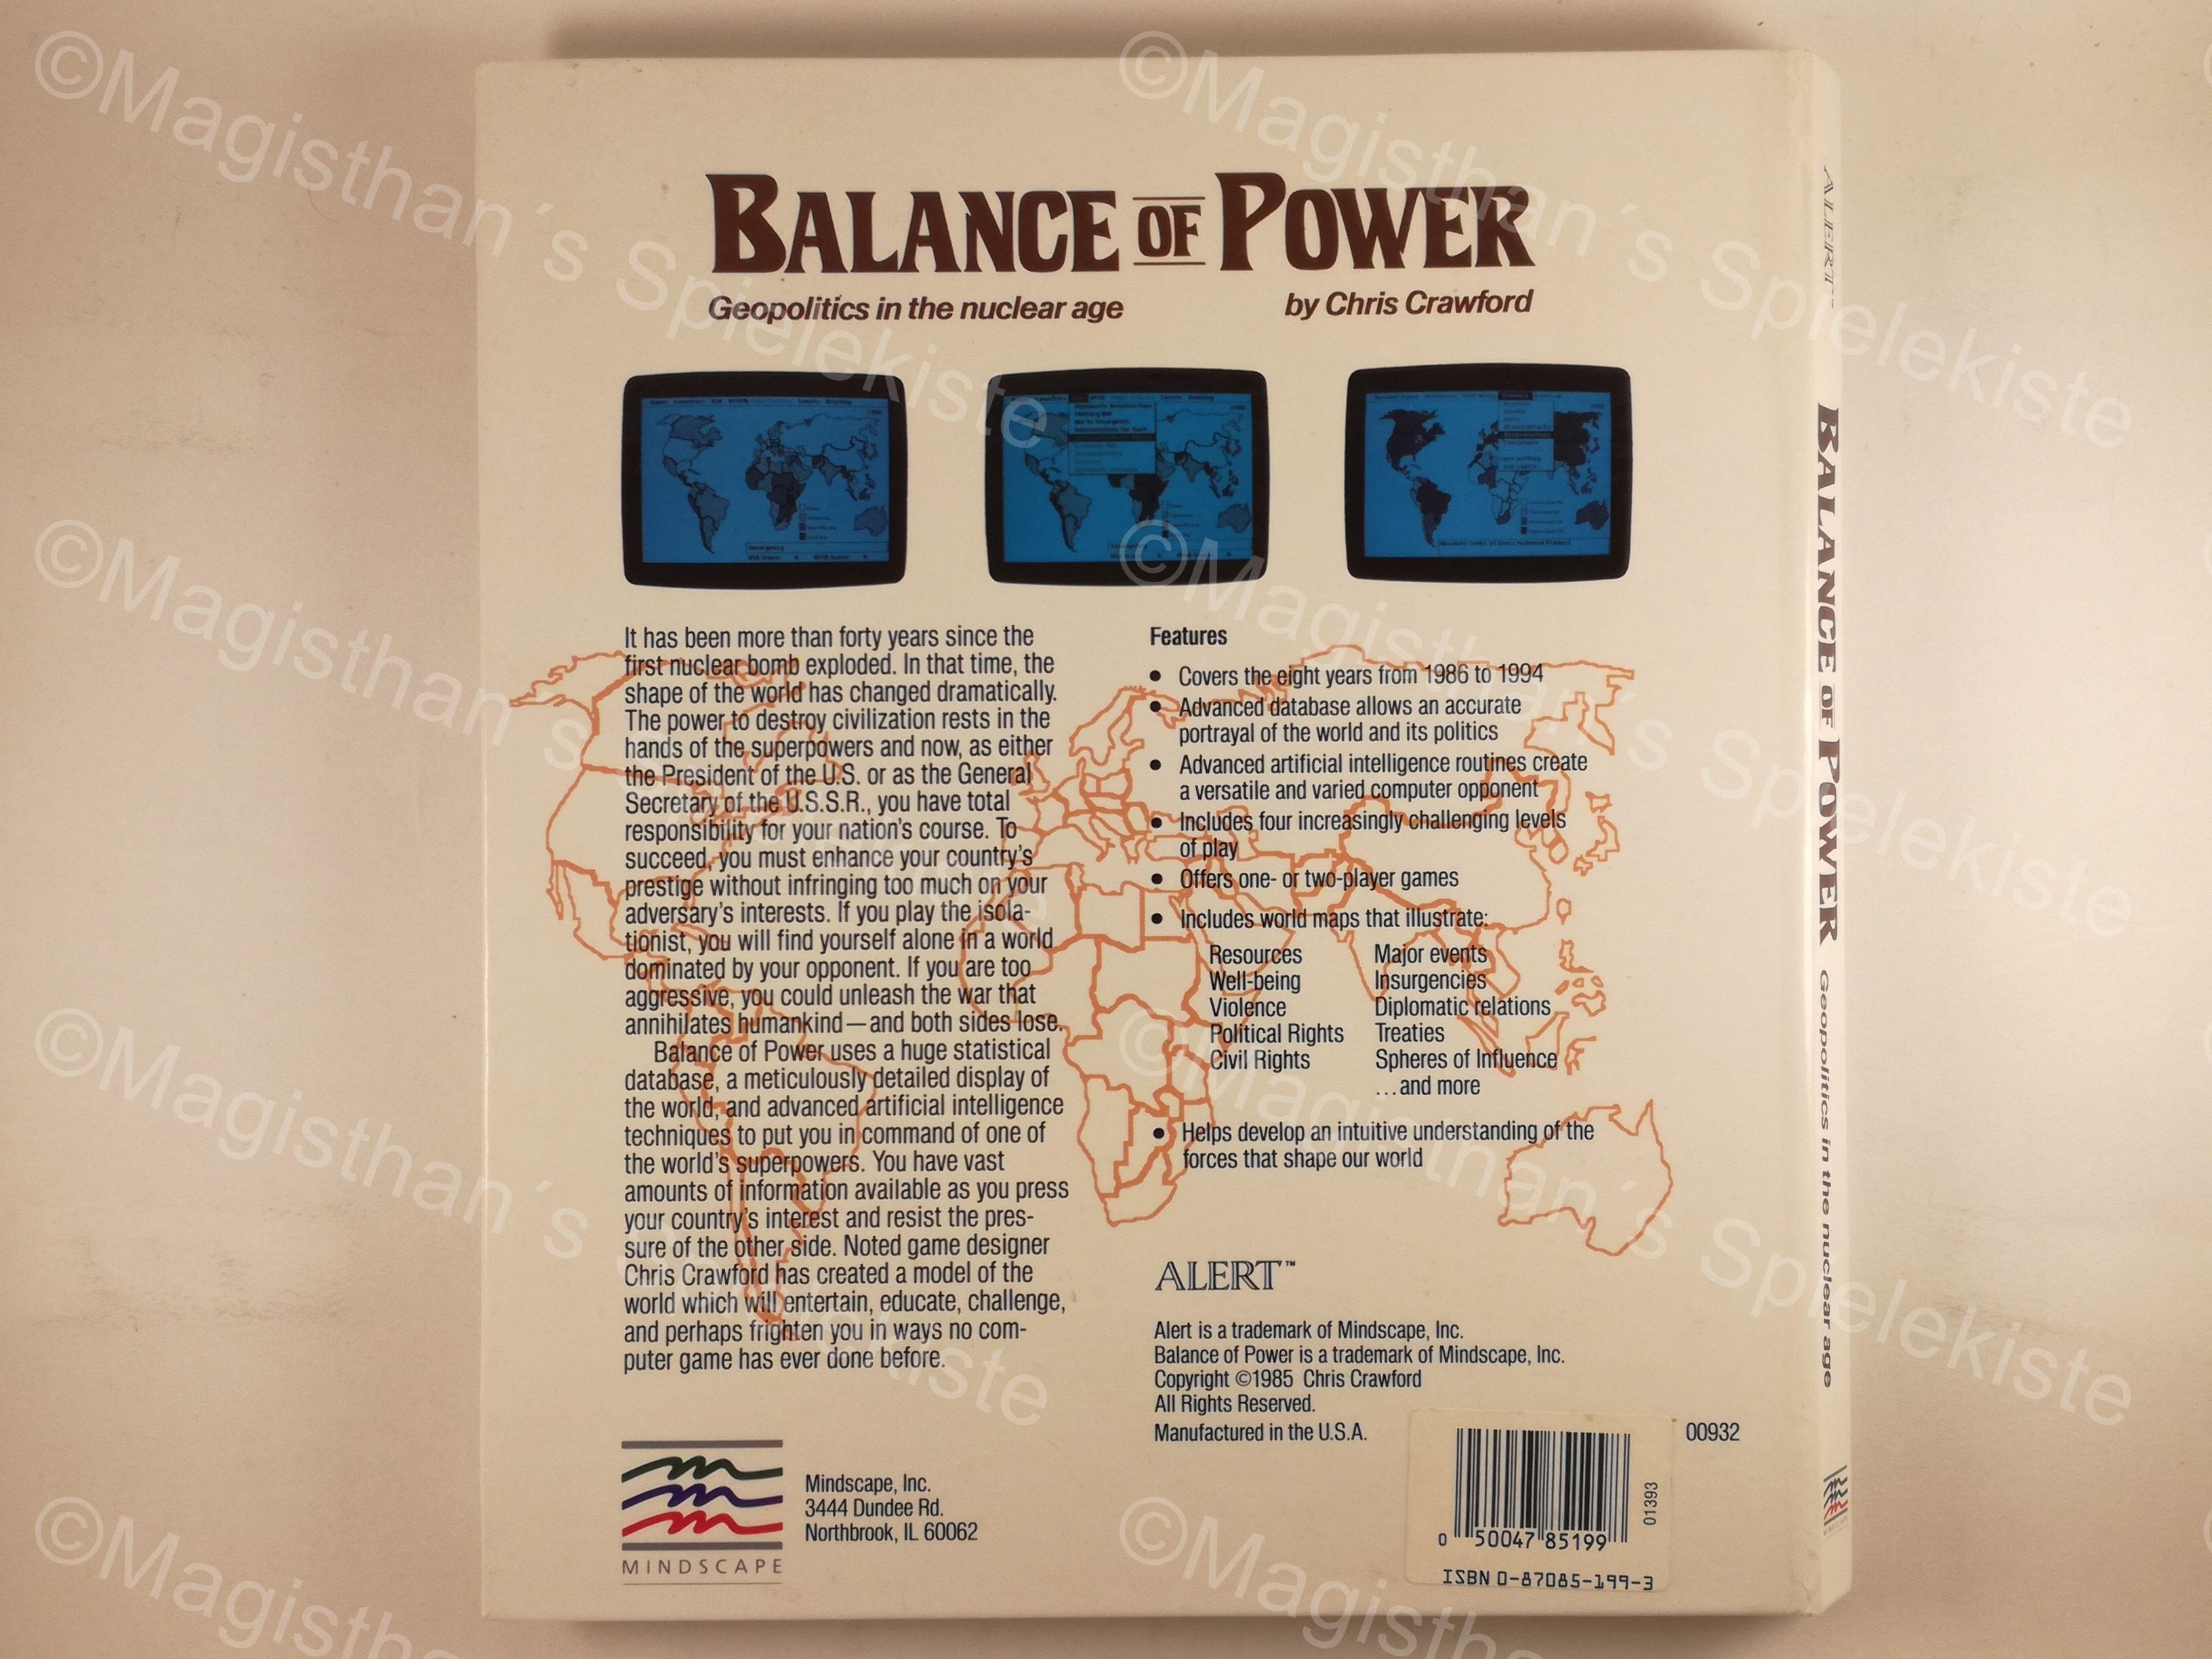 BalanceofPowerAtari1_back.jpg